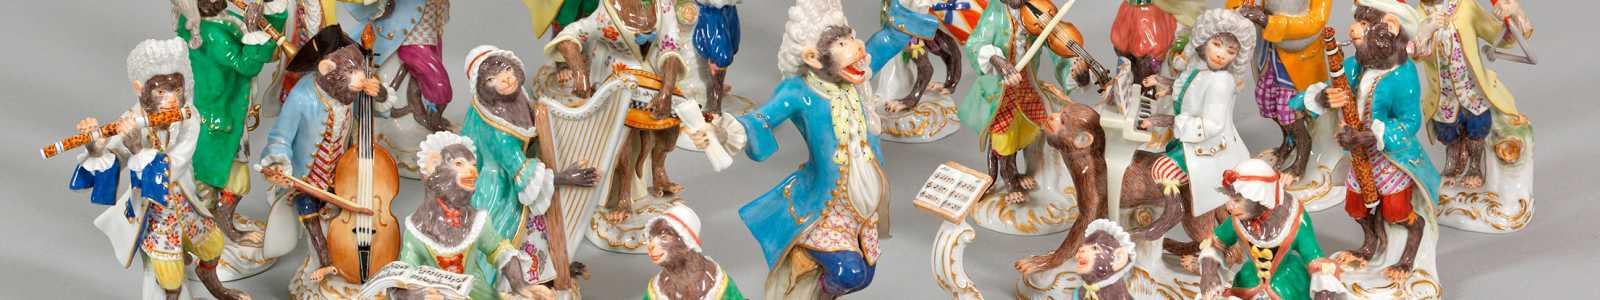 Great Art Auction No 168: Art & Antiques & Jewelry. Part I